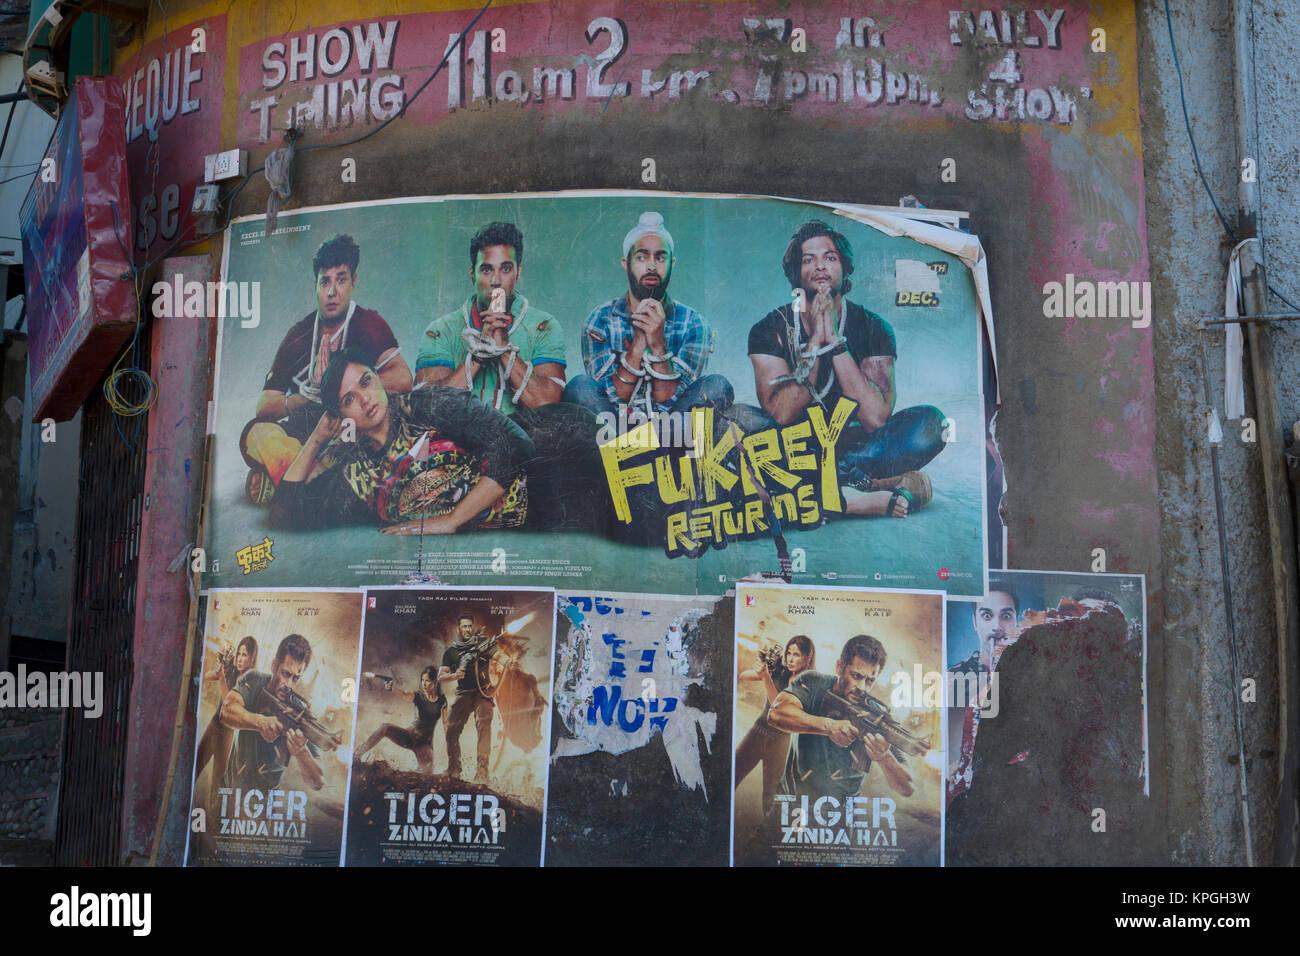 Rustikale Kino mit Bollywood Film Poster zeigt aktuelle Filme in Shimla, Indien Stockbild